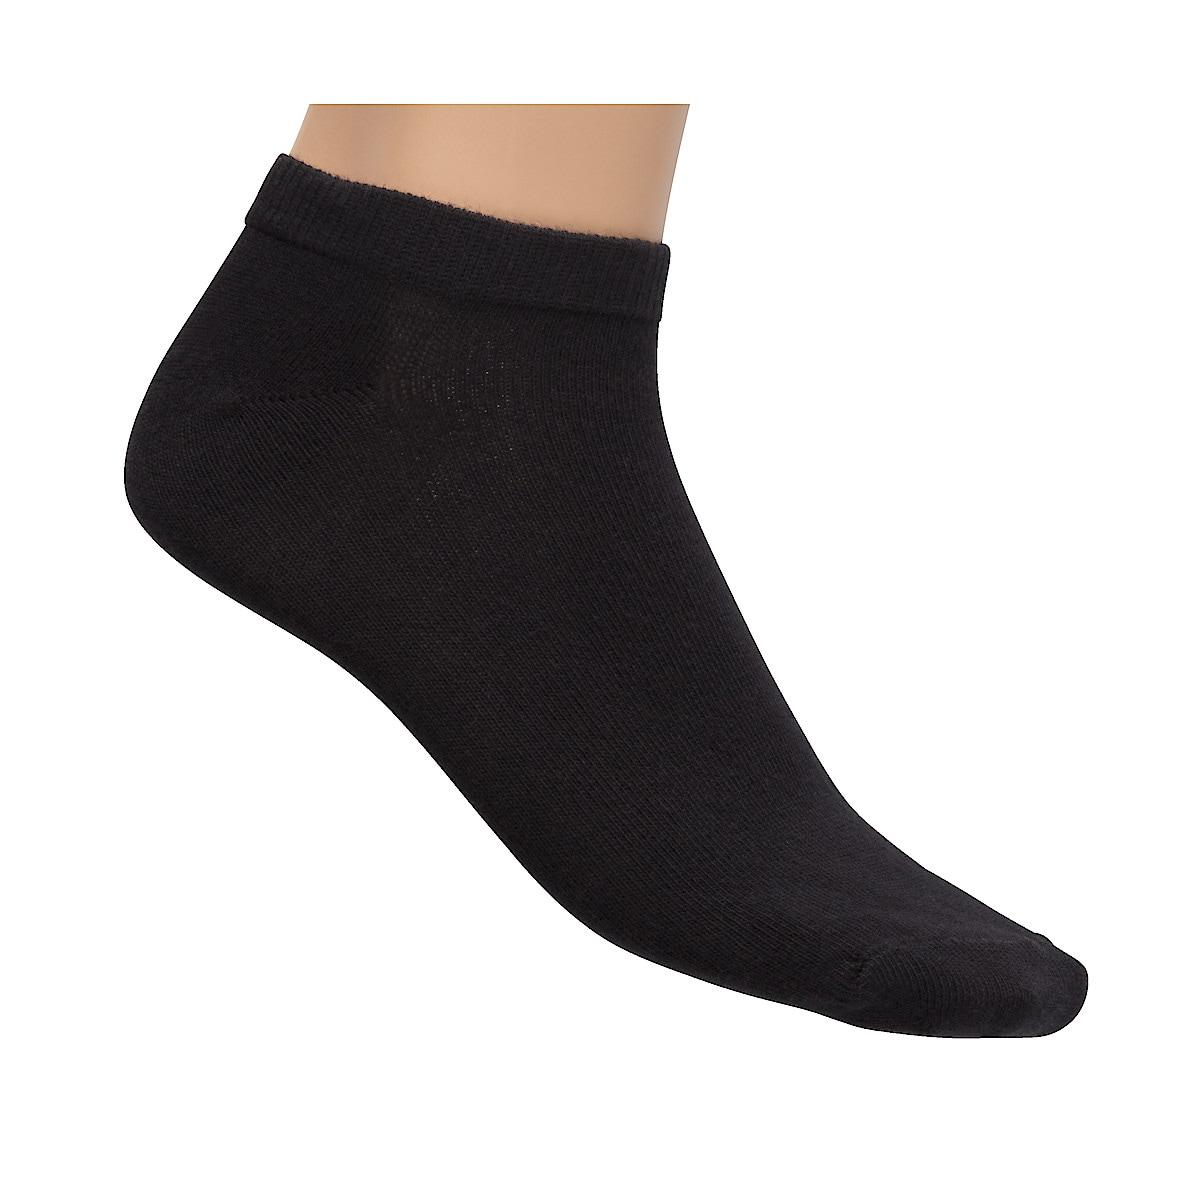 Black Ankle Socks, 5-pack